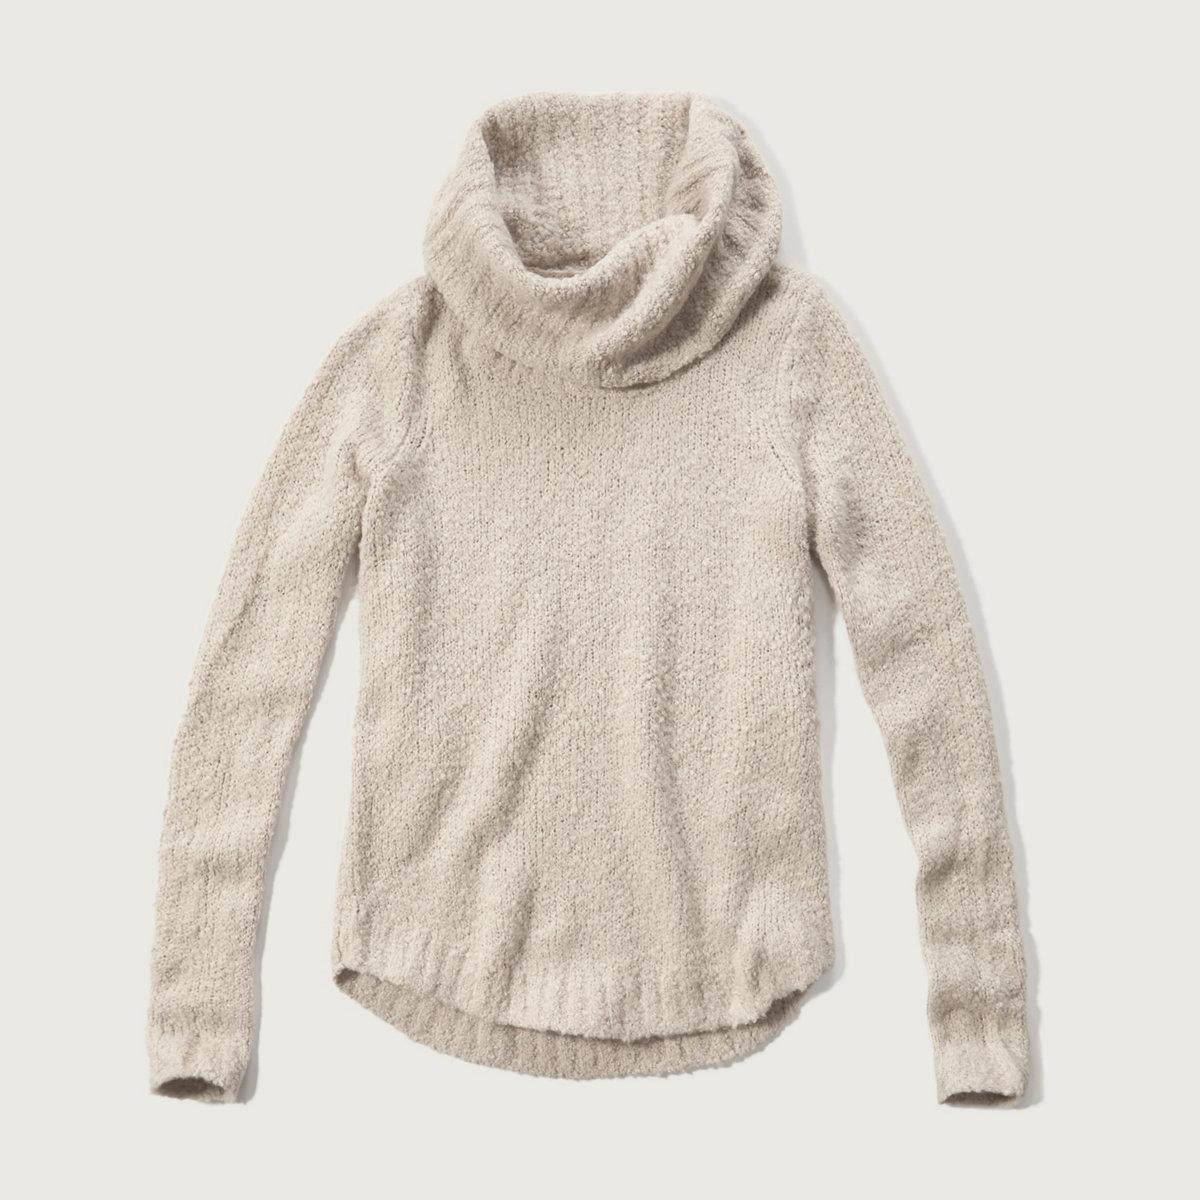 Yarn-dyed Turtleneck Sweater